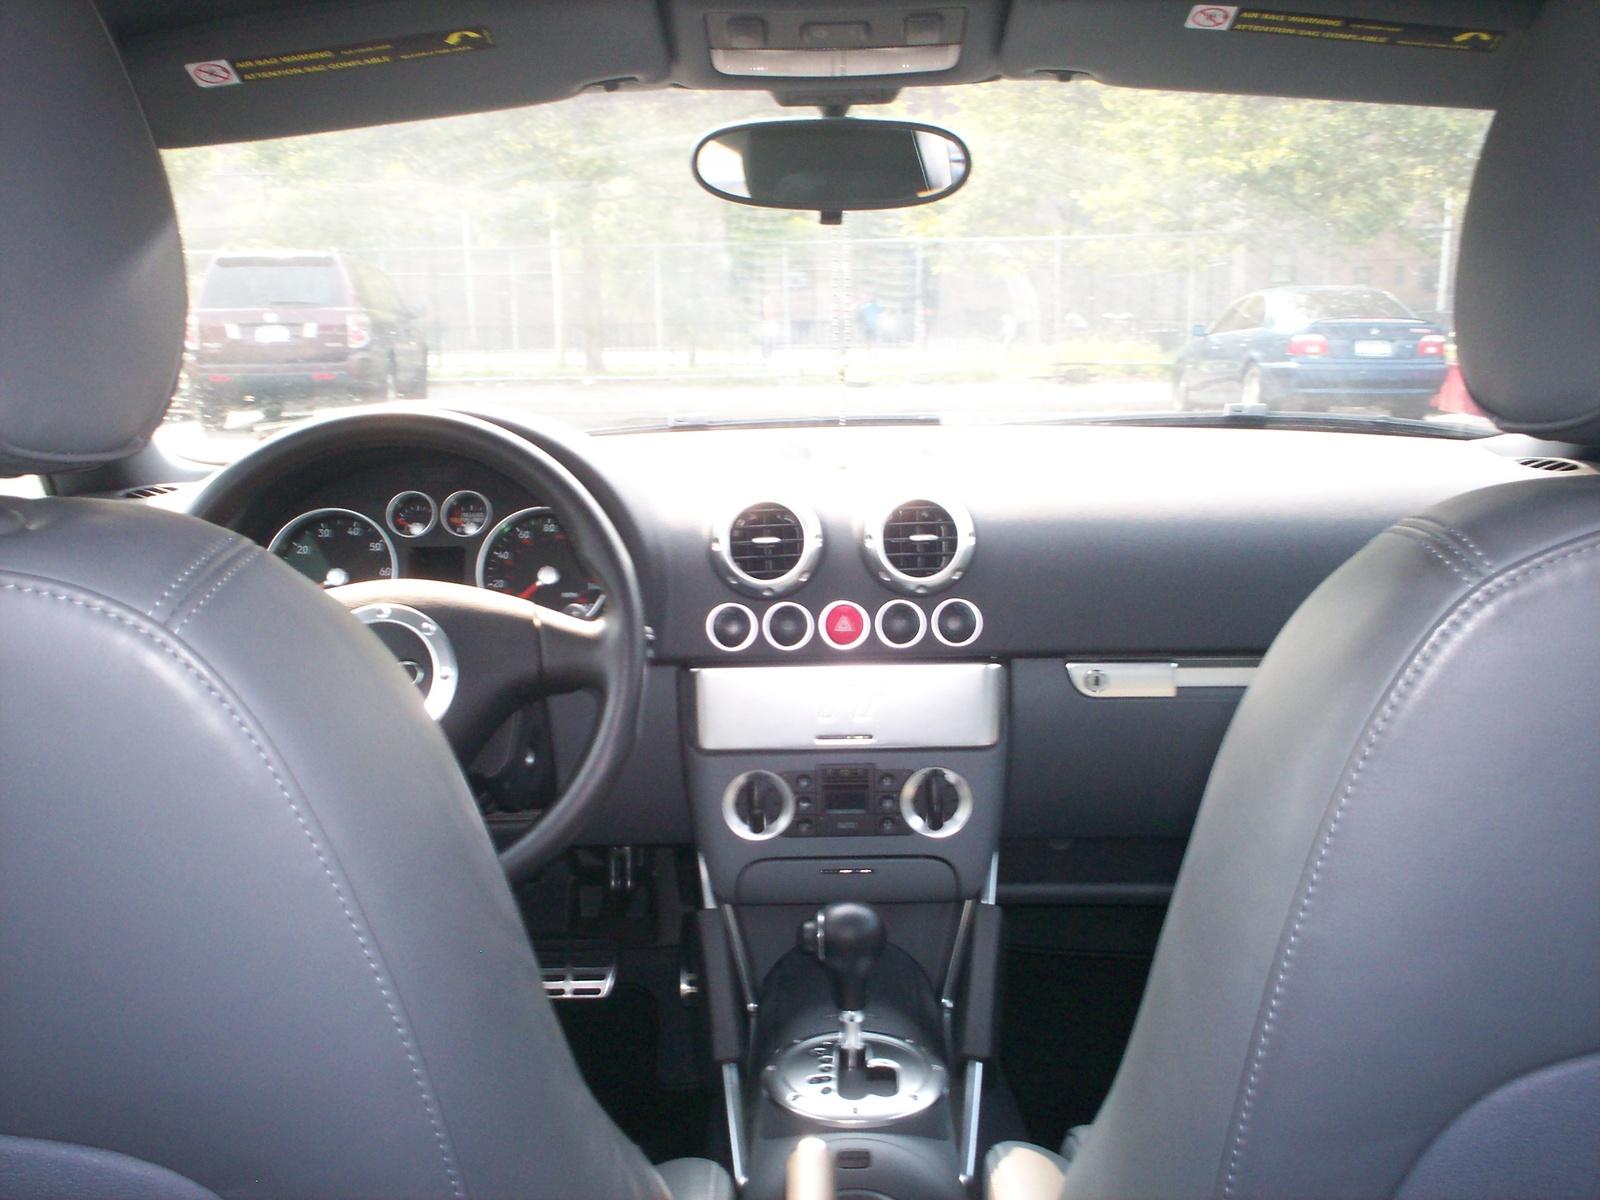 2004 Audi Tt Image 6